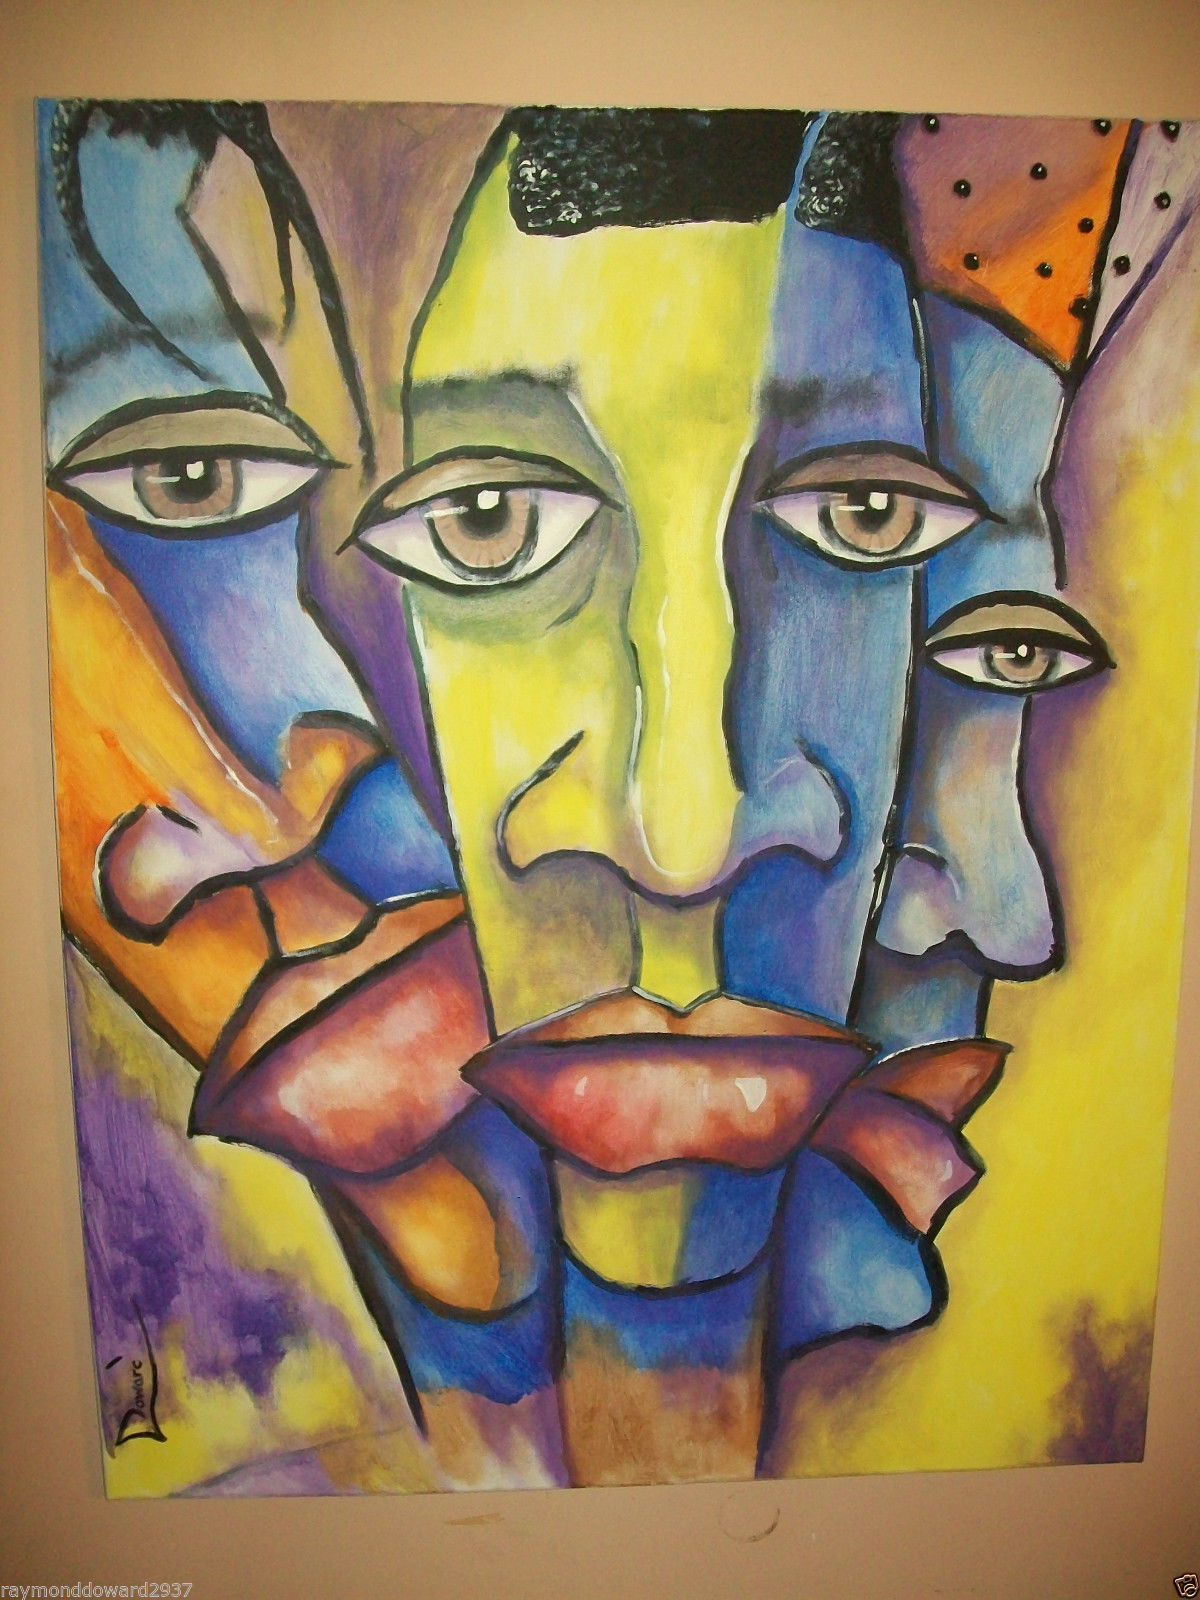 Original 16x20 Ethic African American Urban Art Canvas